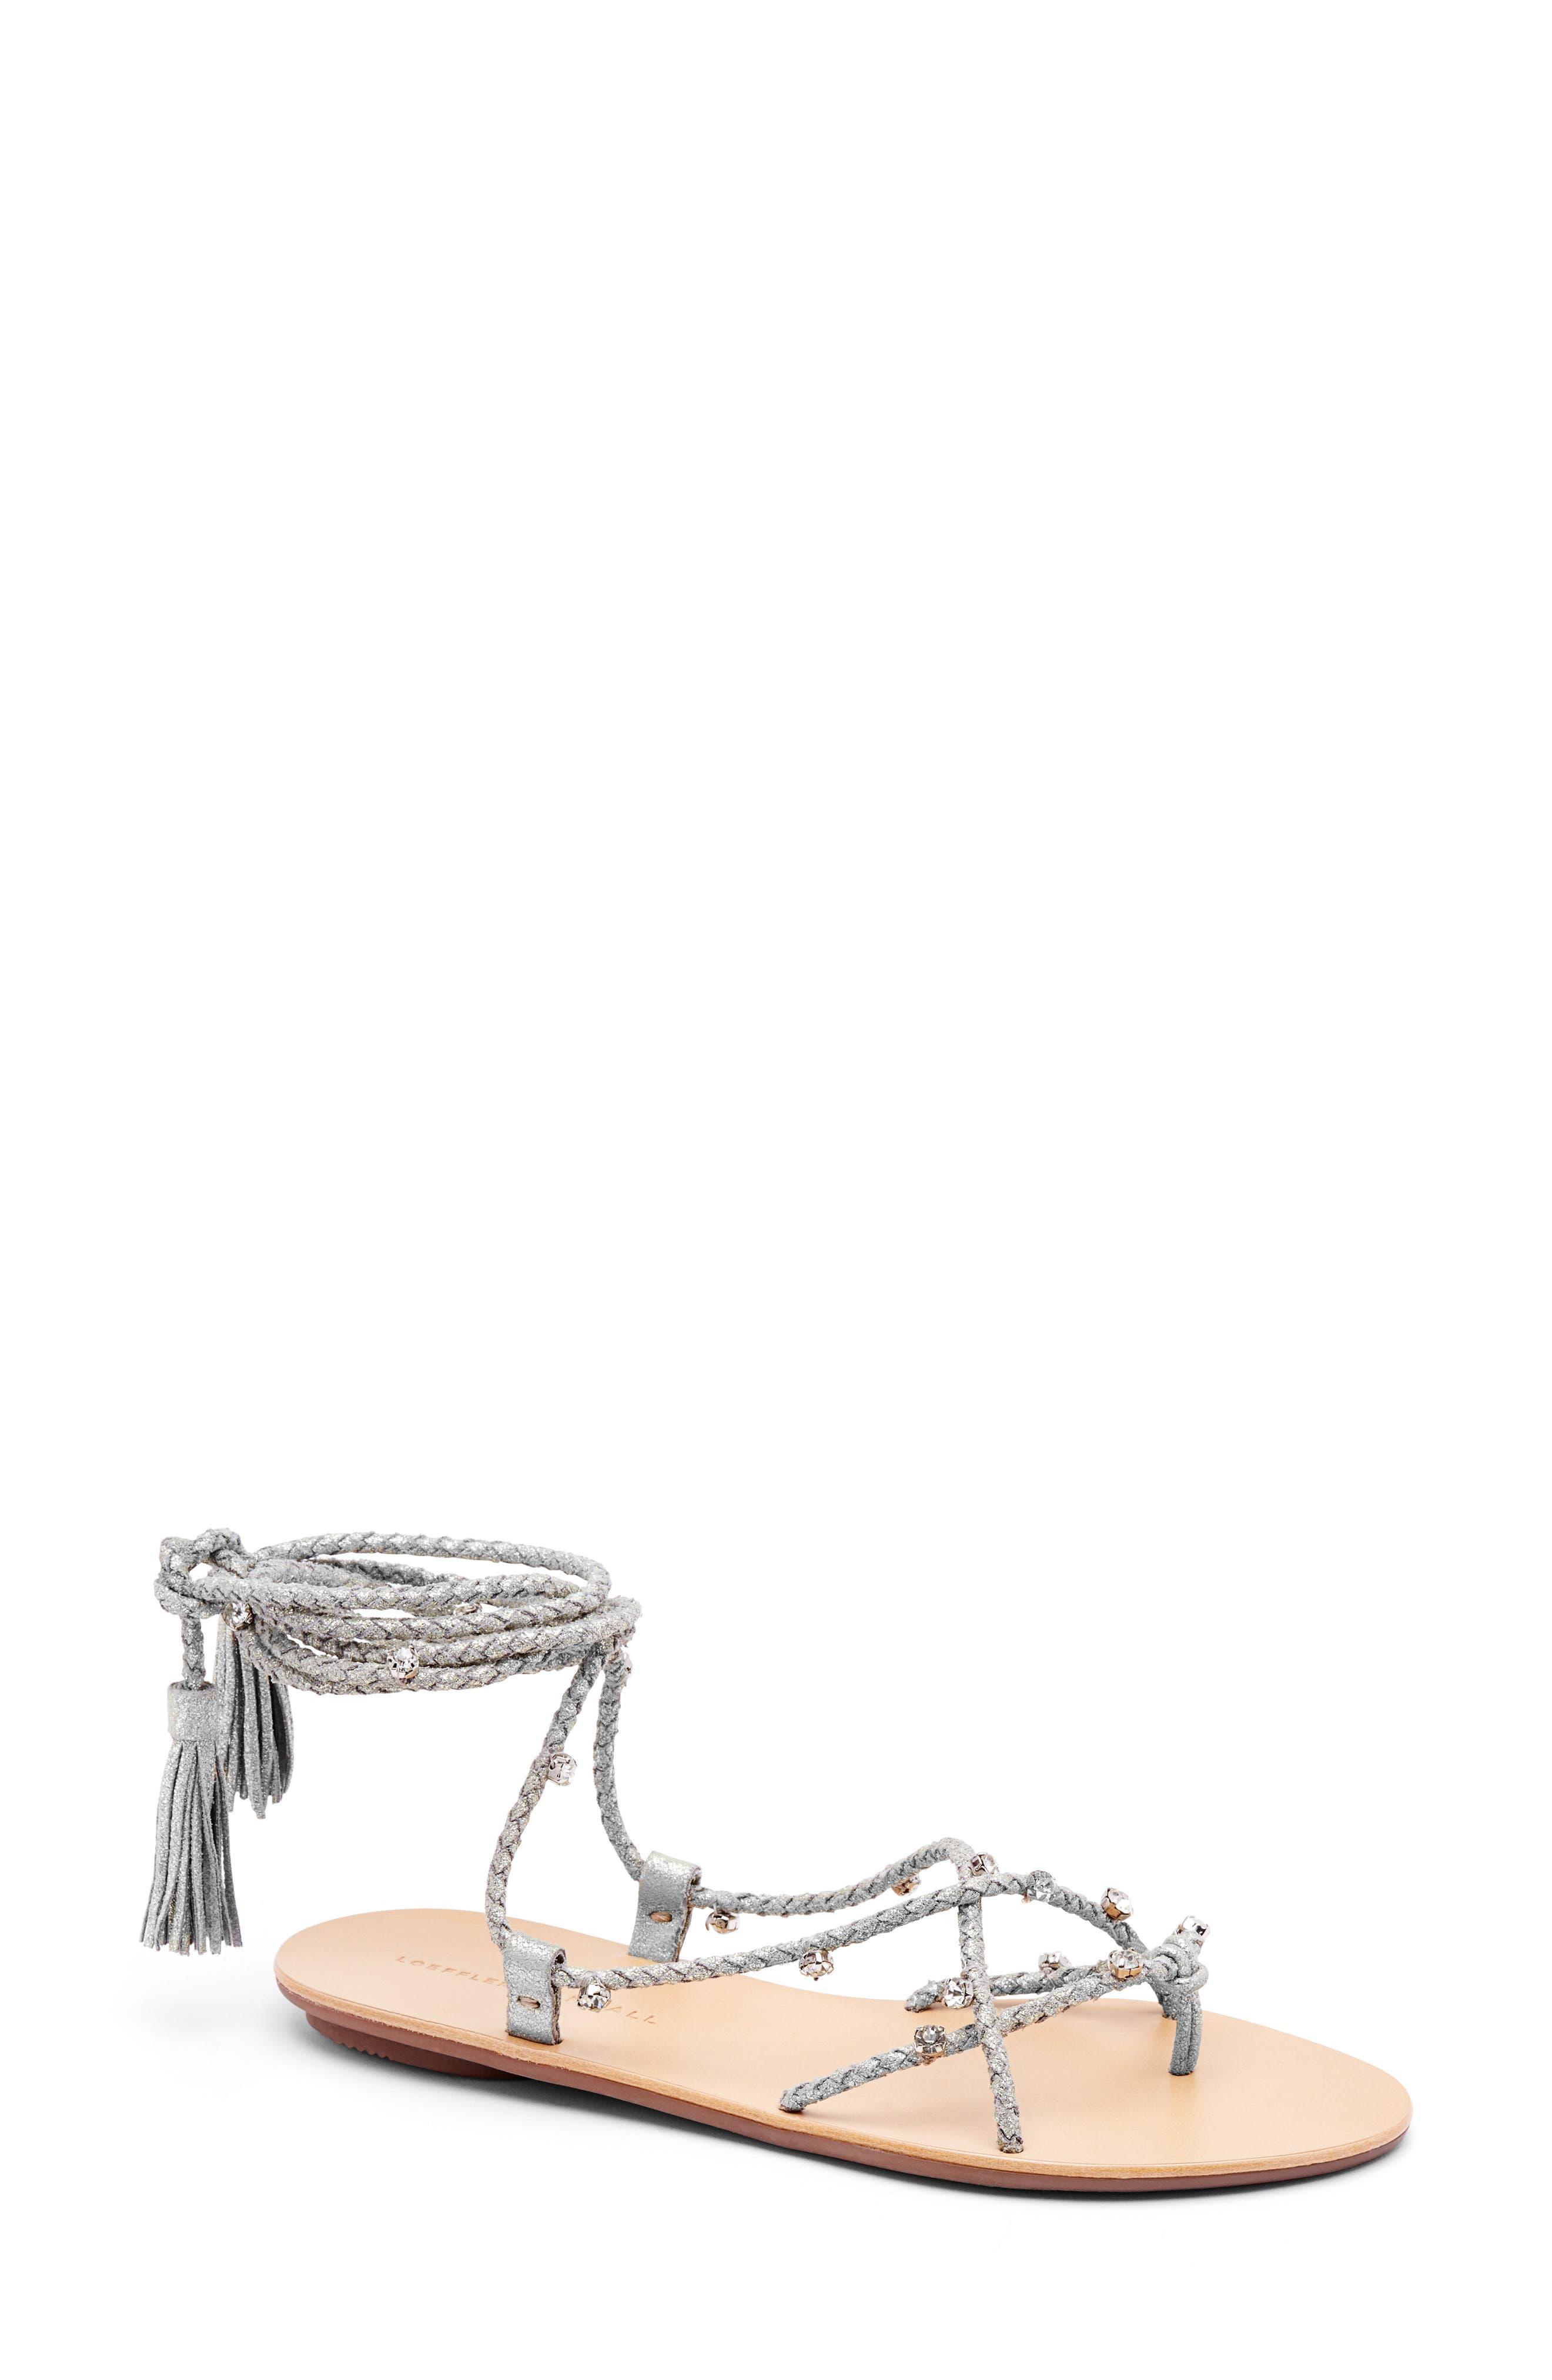 Bo Ankle Wrap Sandal,                         Main,                         color, 040